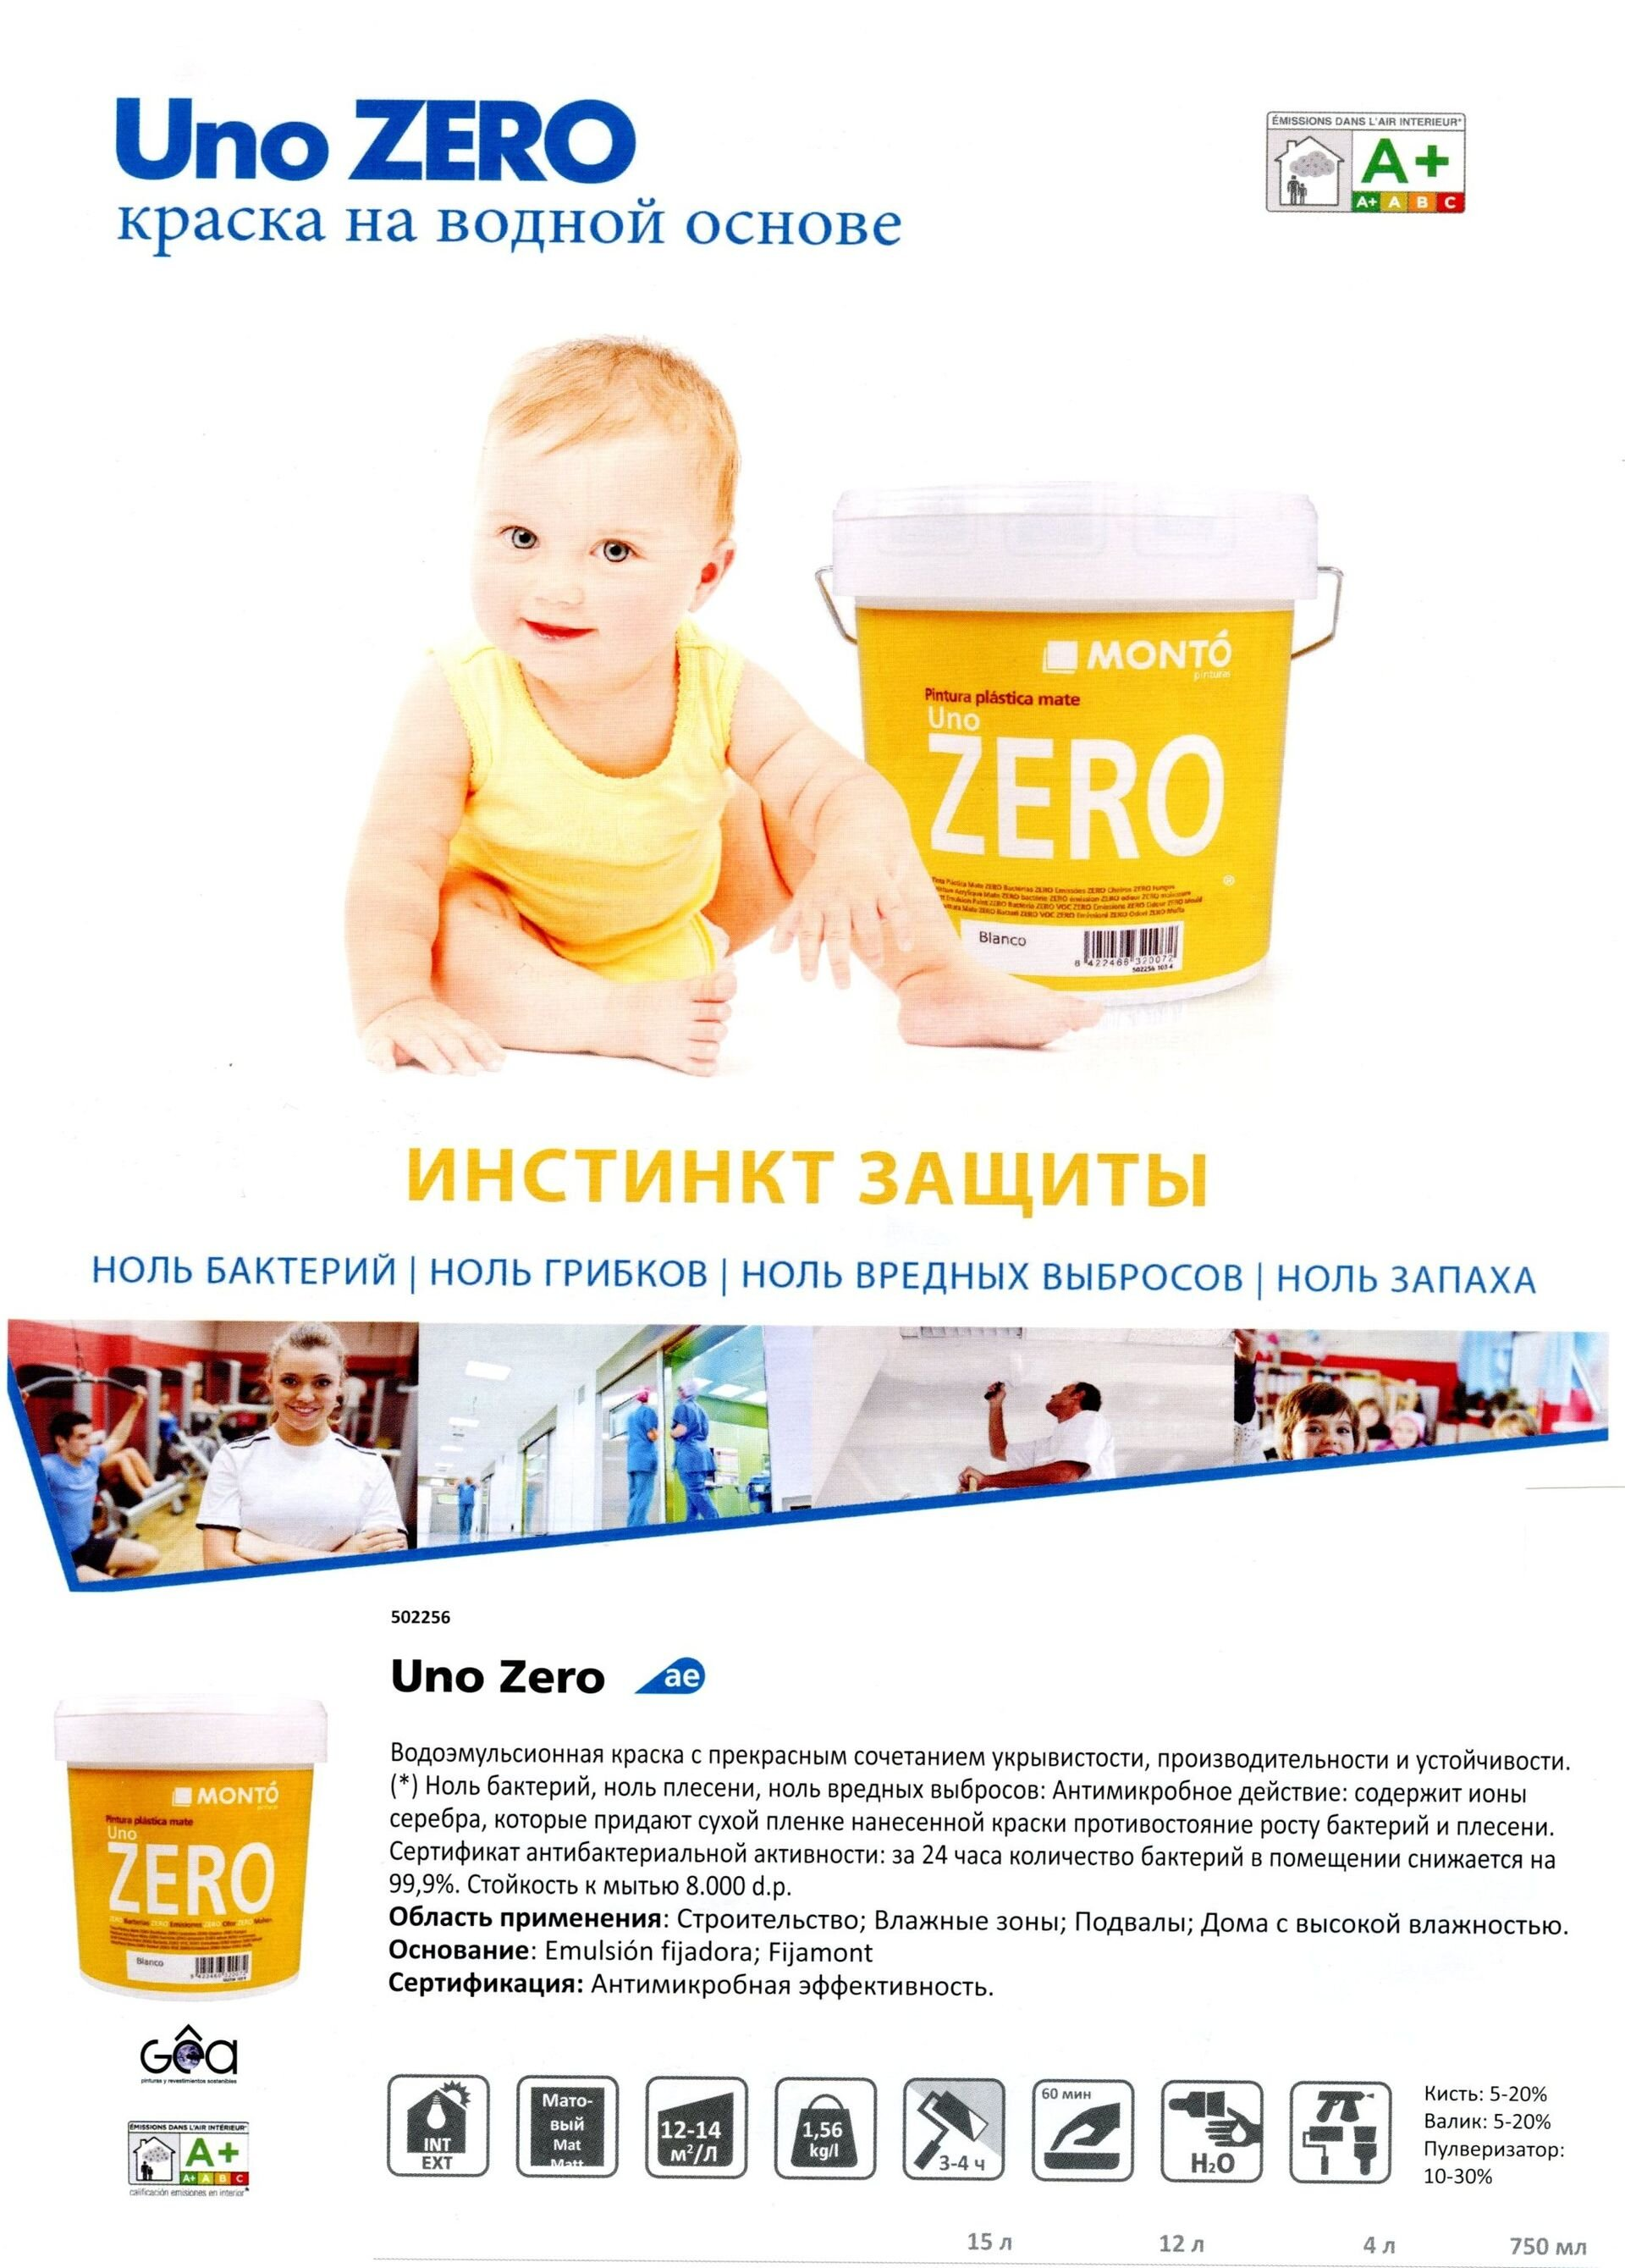 Краска для детской антибактериальная Monto Uno Zero Blanco 0,75 - фото pic_c1f66effde5b2a7_1920x9000_1.jpg